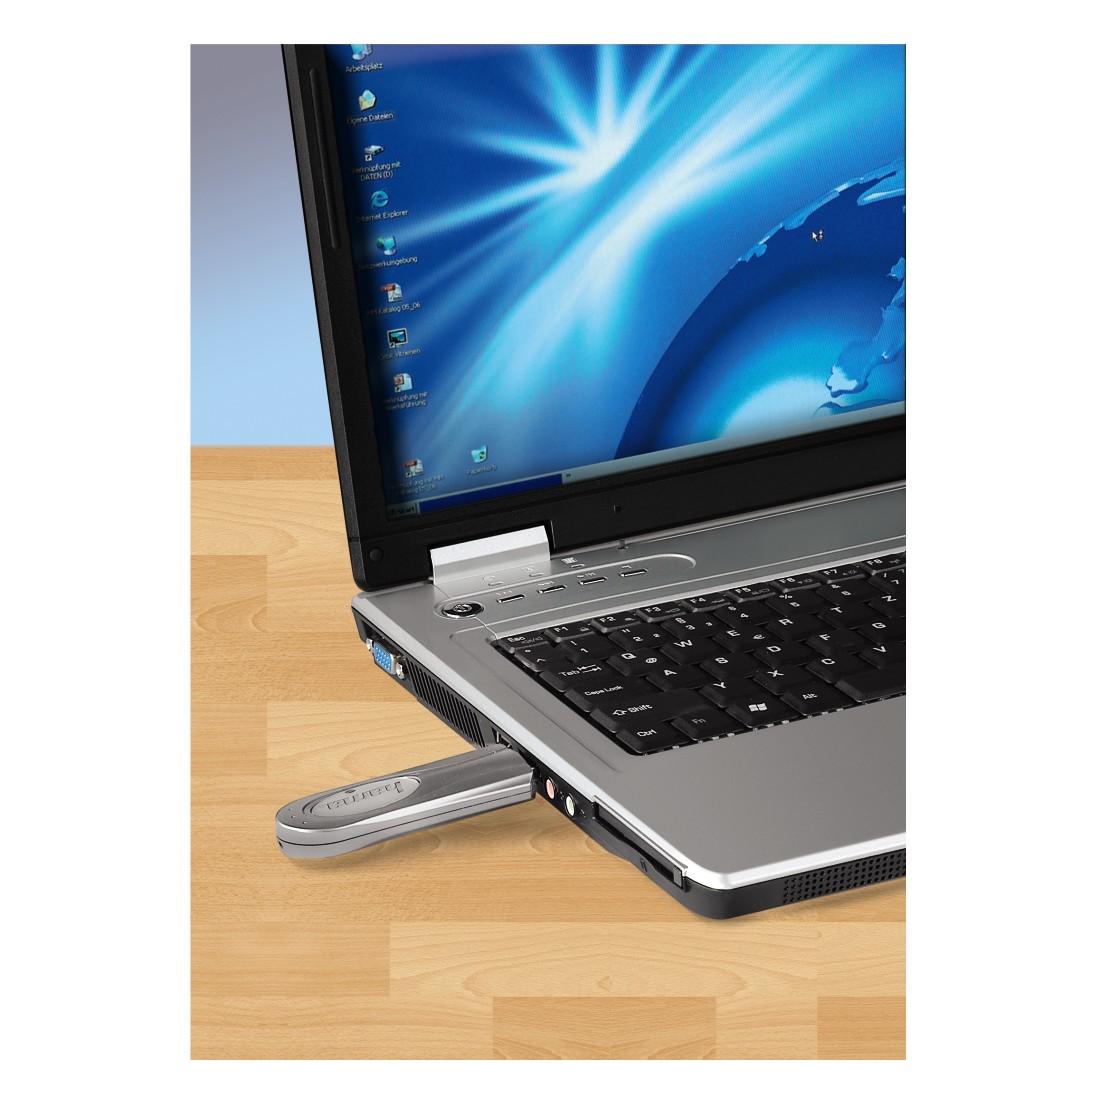 HAMA 108 Mbps Wireless LAN USB Stick Drivers for Windows